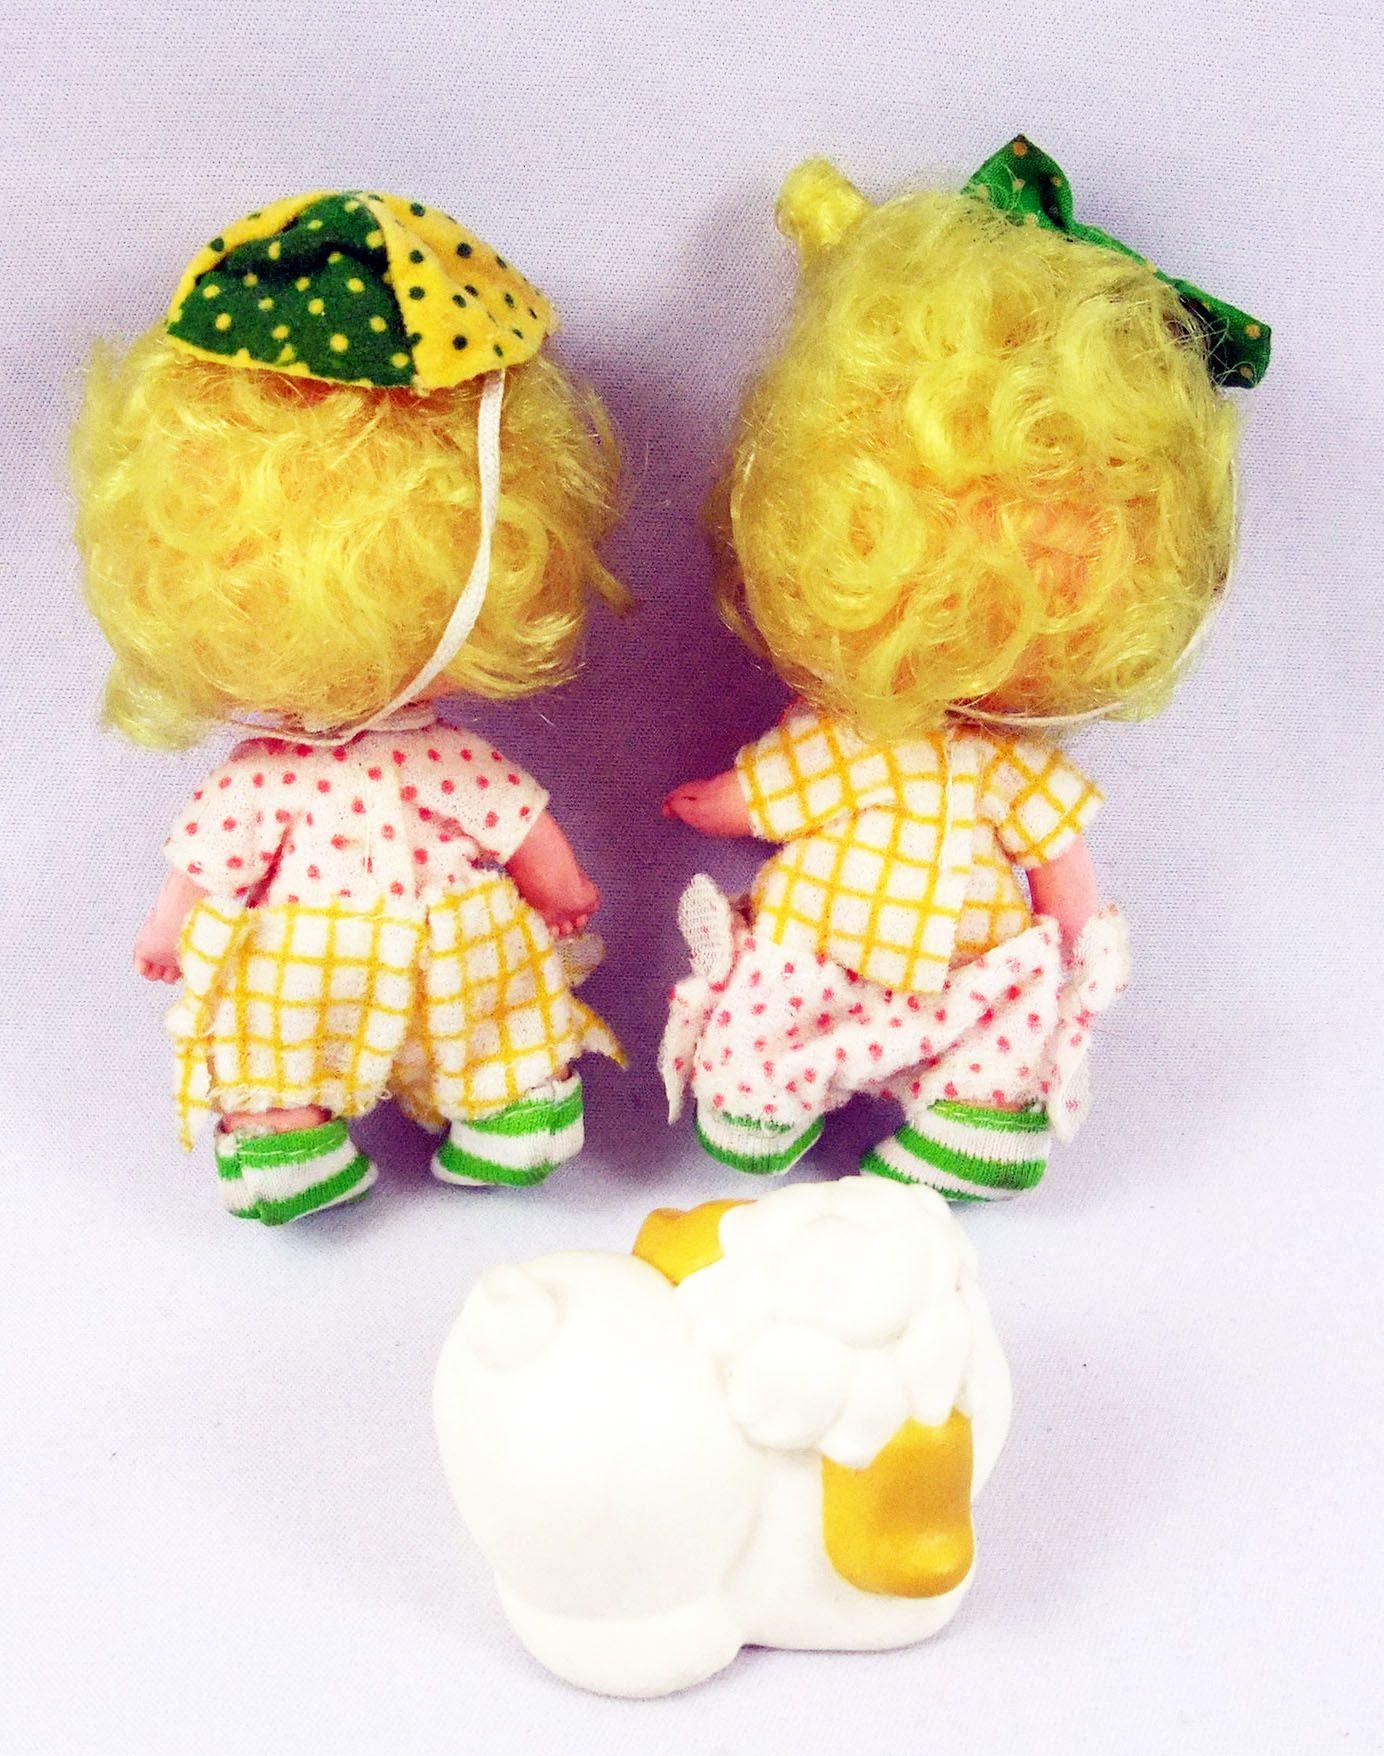 Charlotte aux fraises - Lem and Ada & Sugar Woofer / Orange et Jade & Su-sucre (loose)